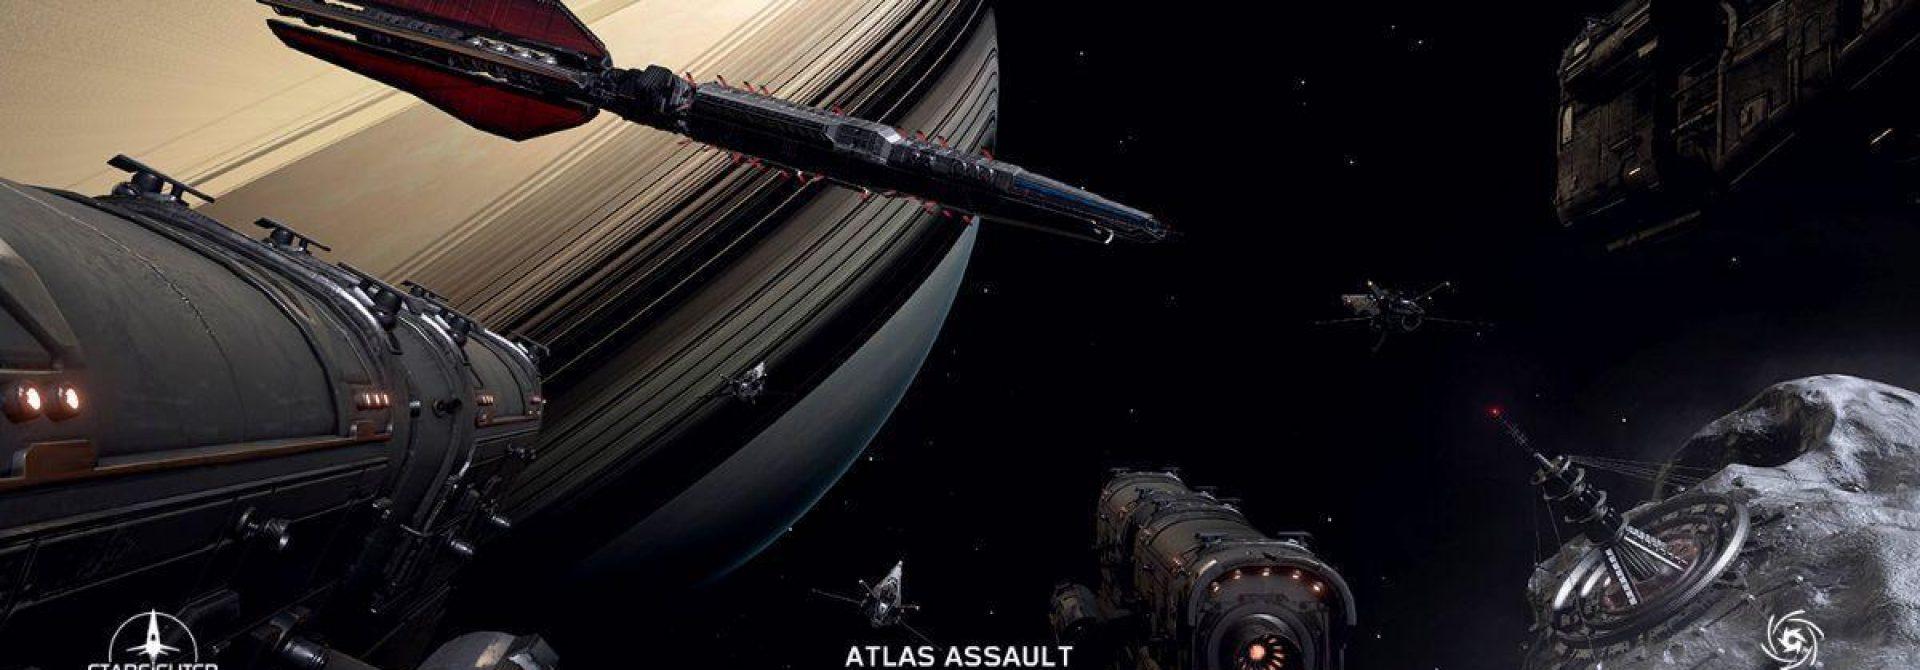 PAX East: Space Sim Starfighter Inc. Announced